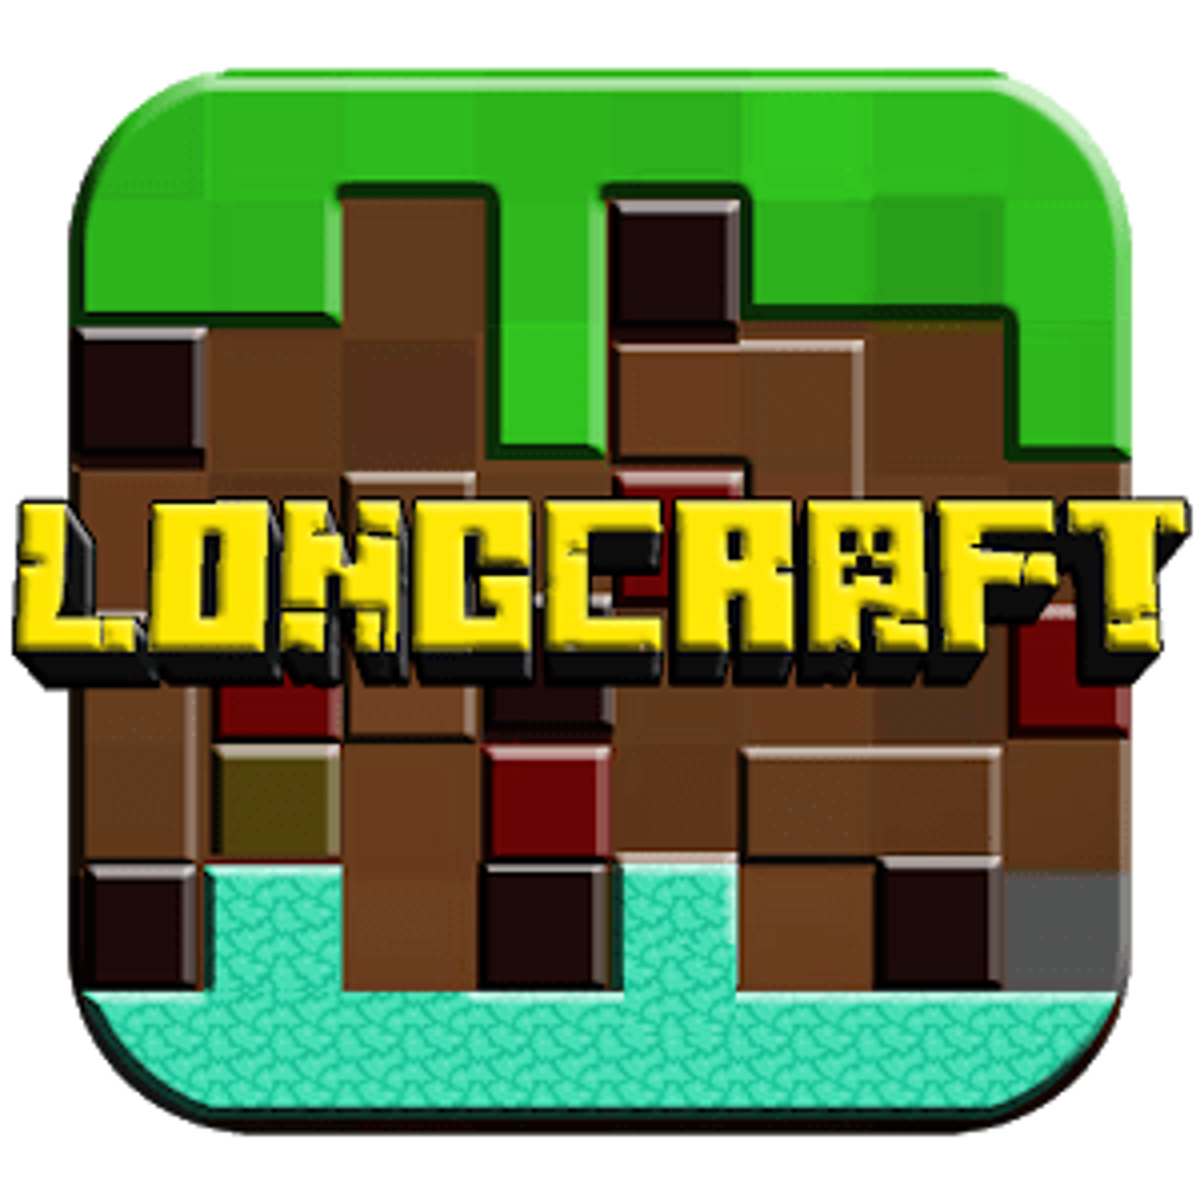 Long Craft World Of Pixel